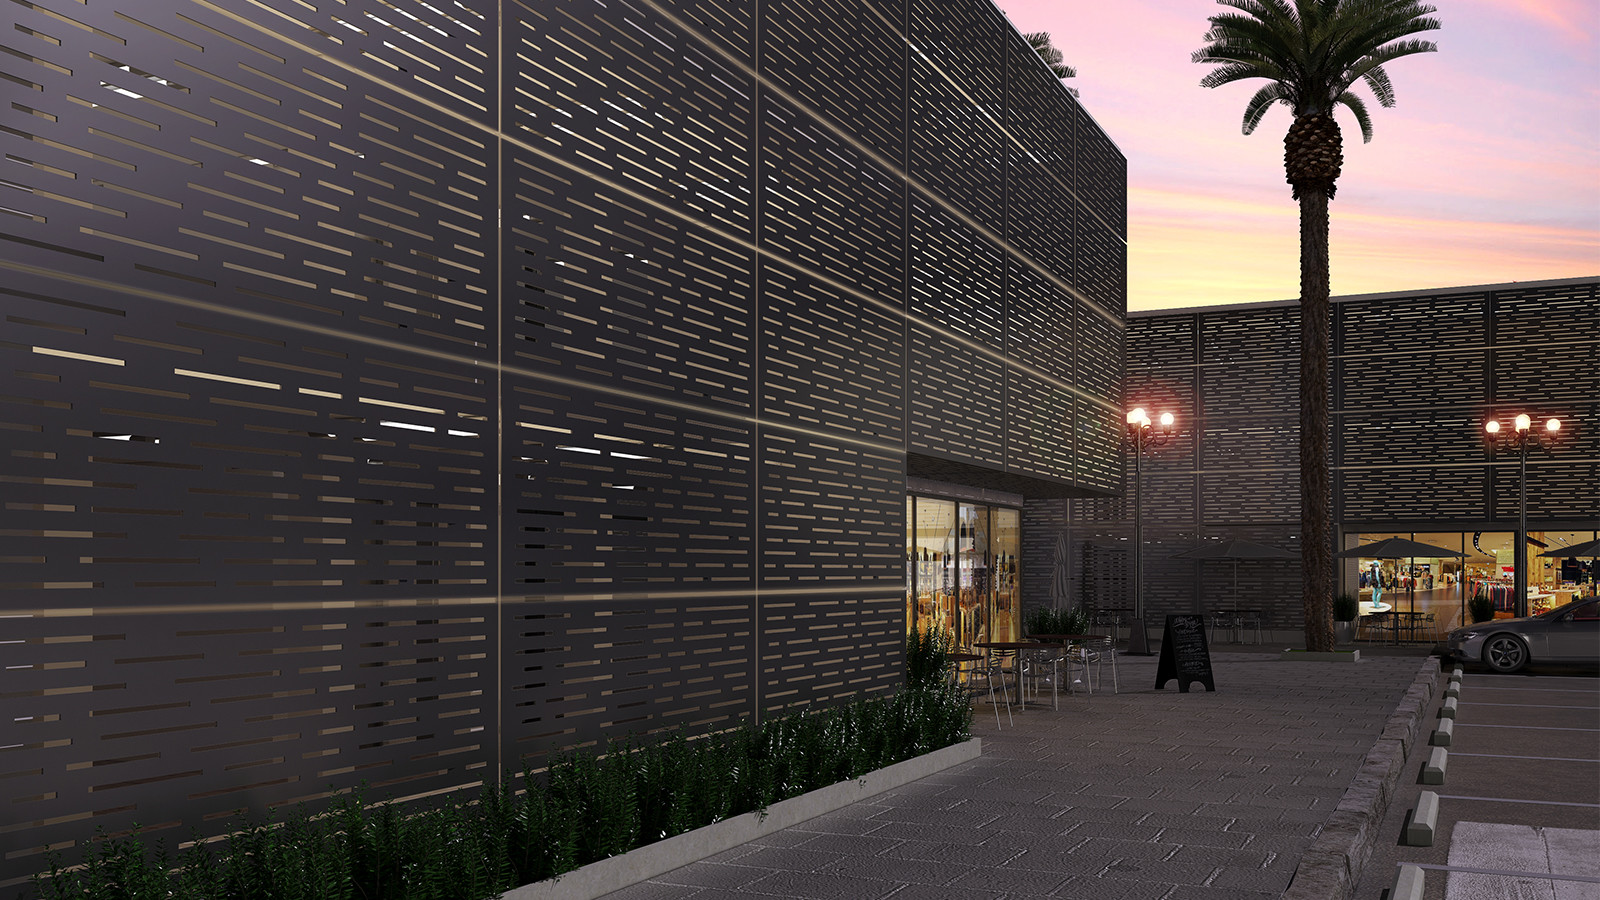 Moz Laser Cut Metal Architectural Exterior Panels Lines pattern